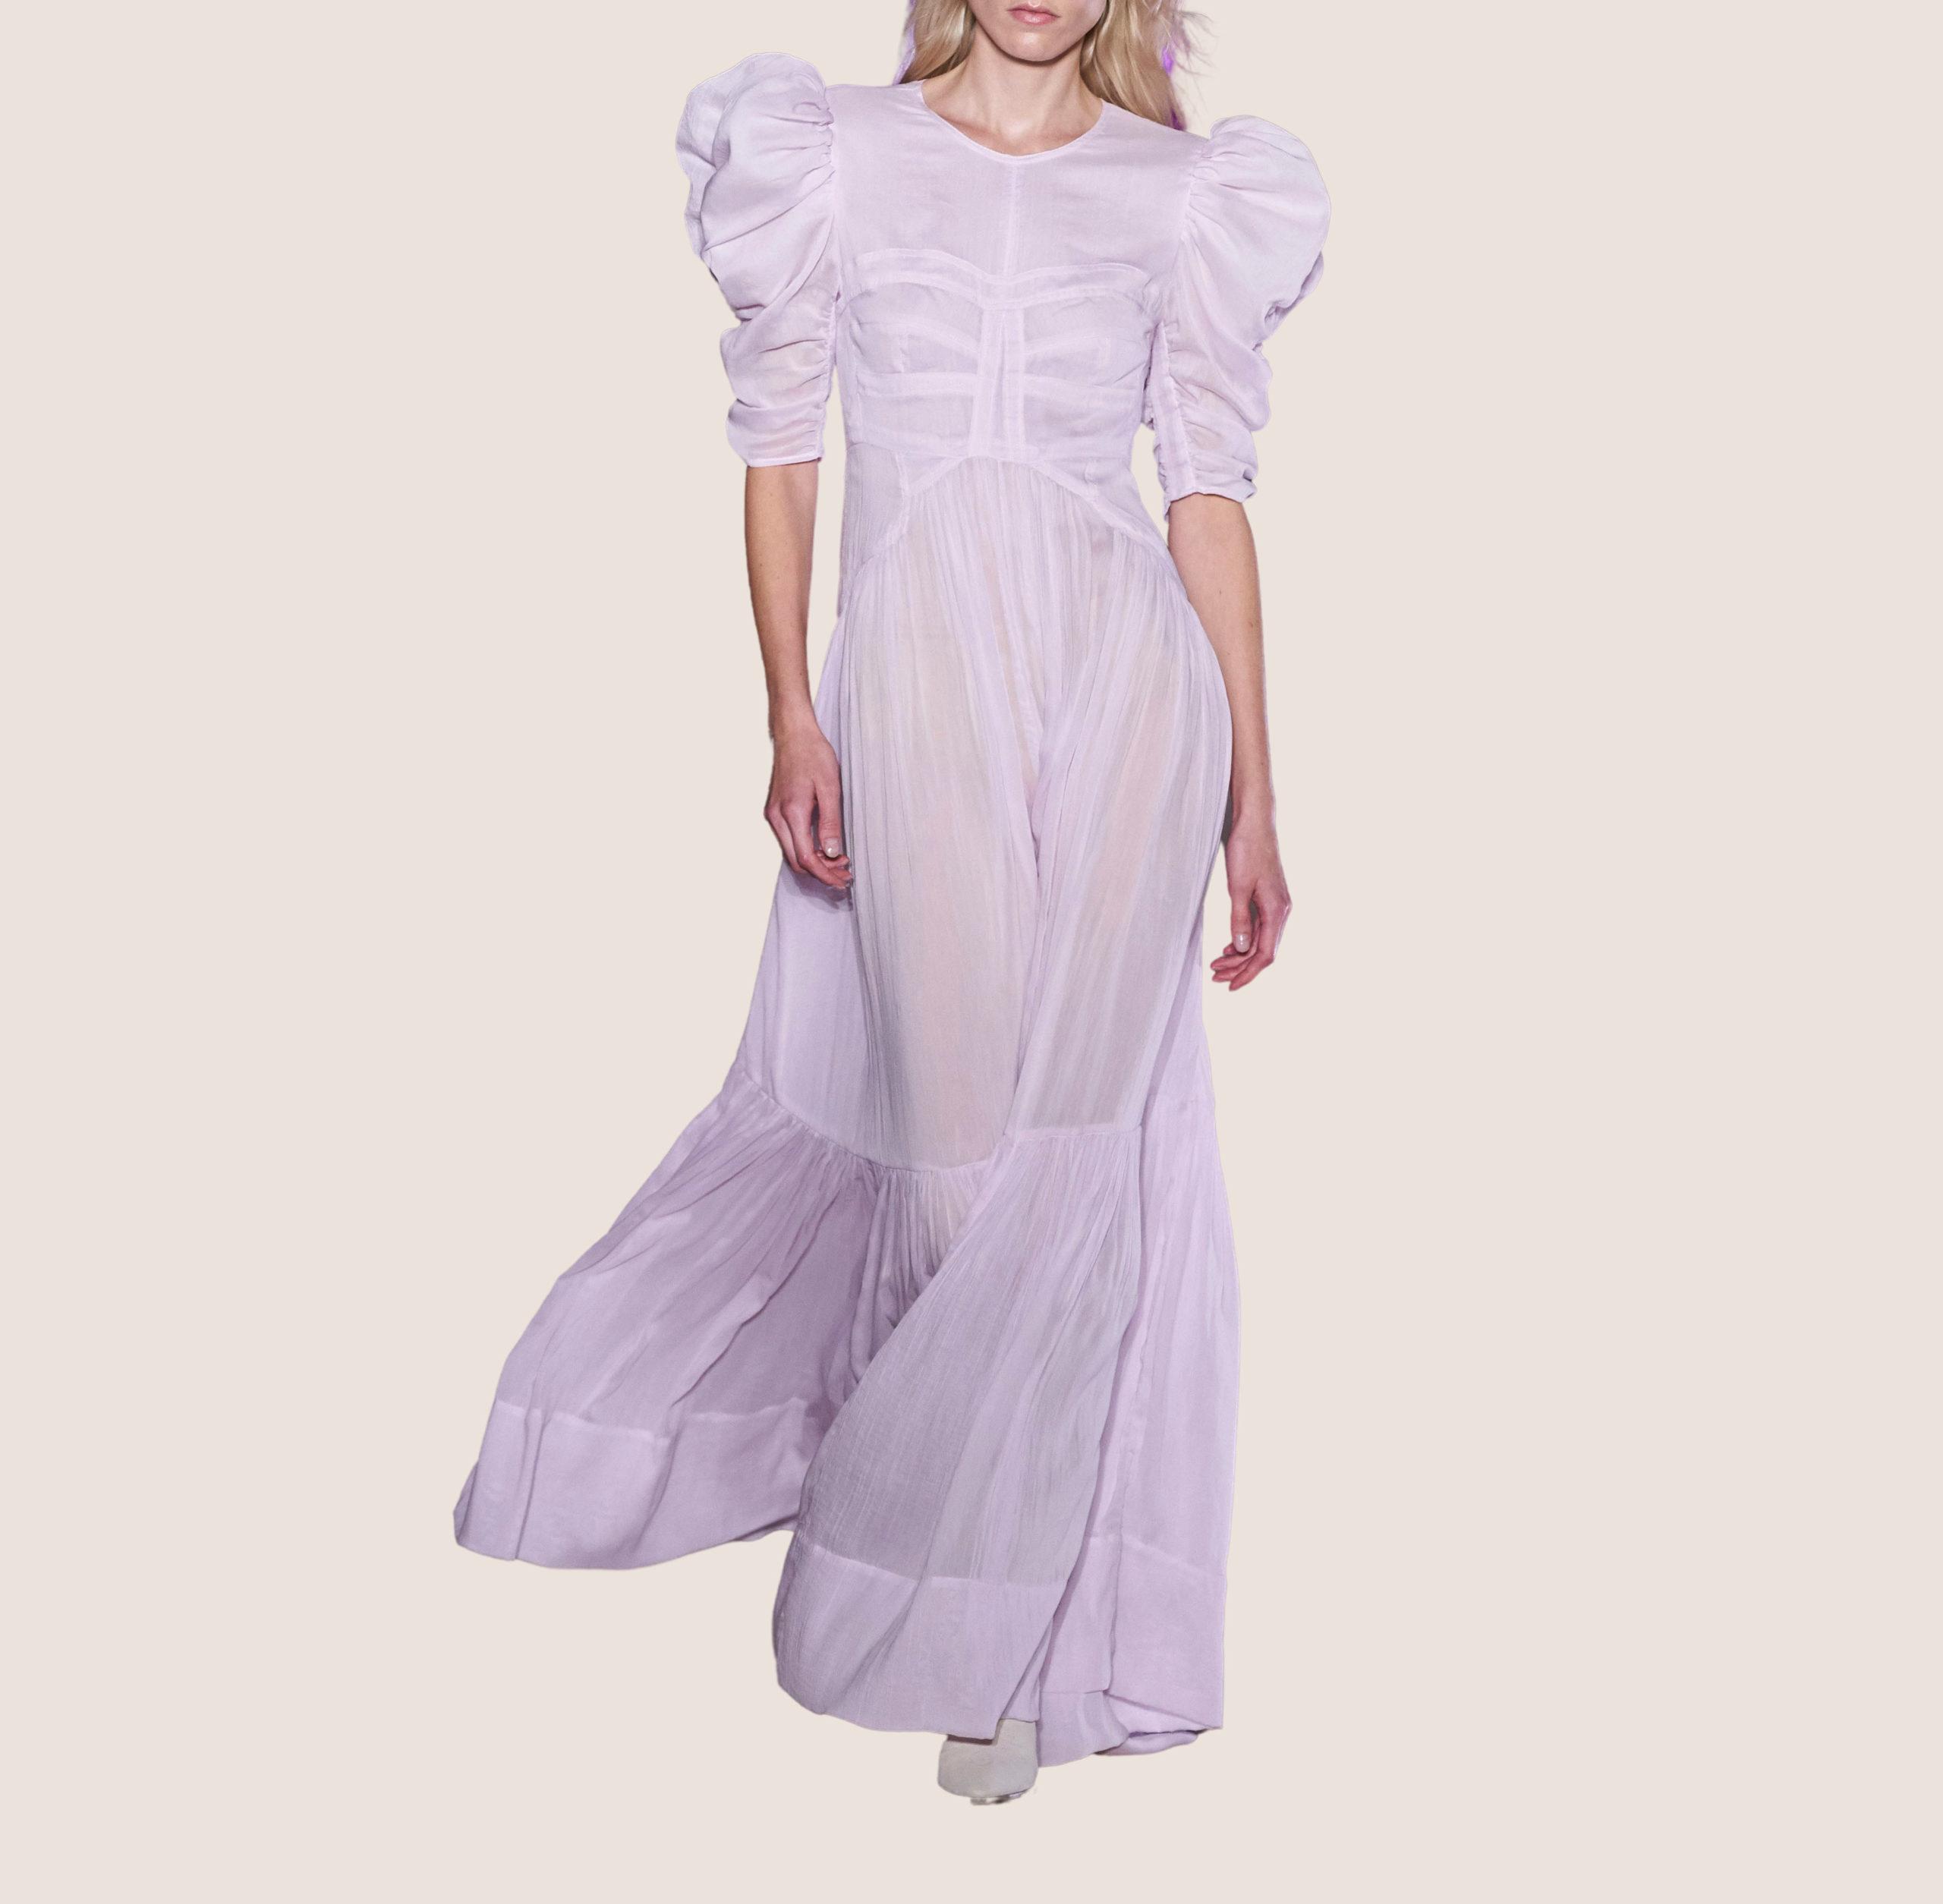 Katici Dress